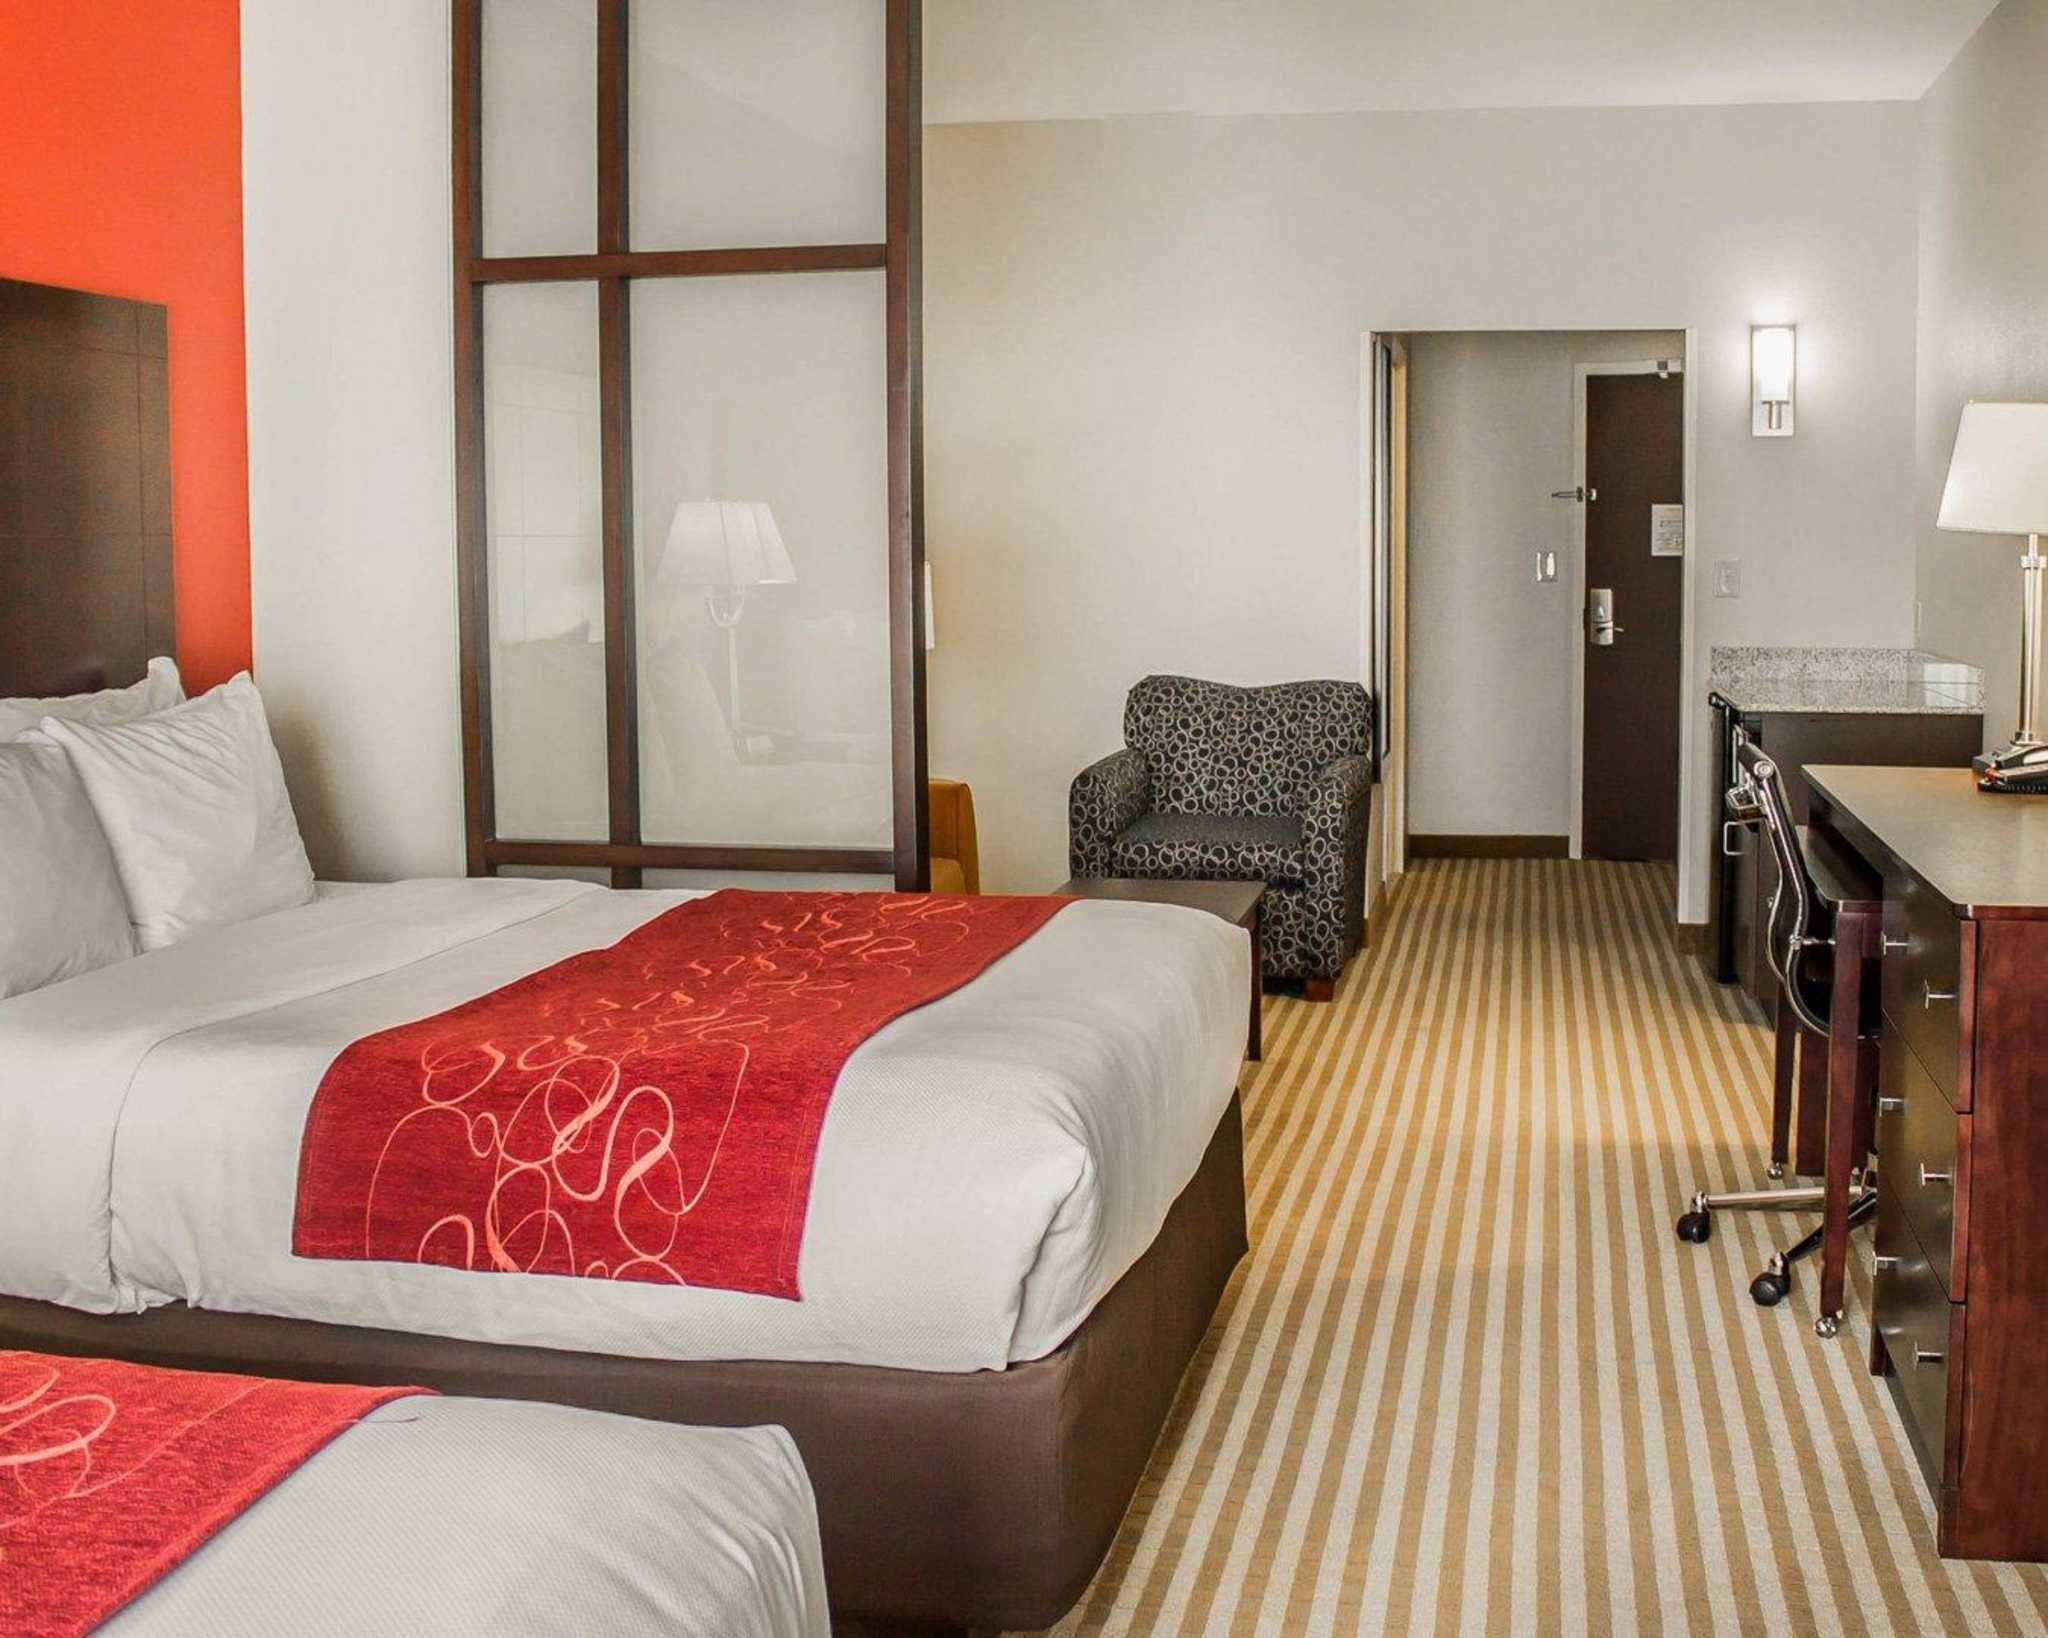 Comfort Suites East Broad at 270 image 25